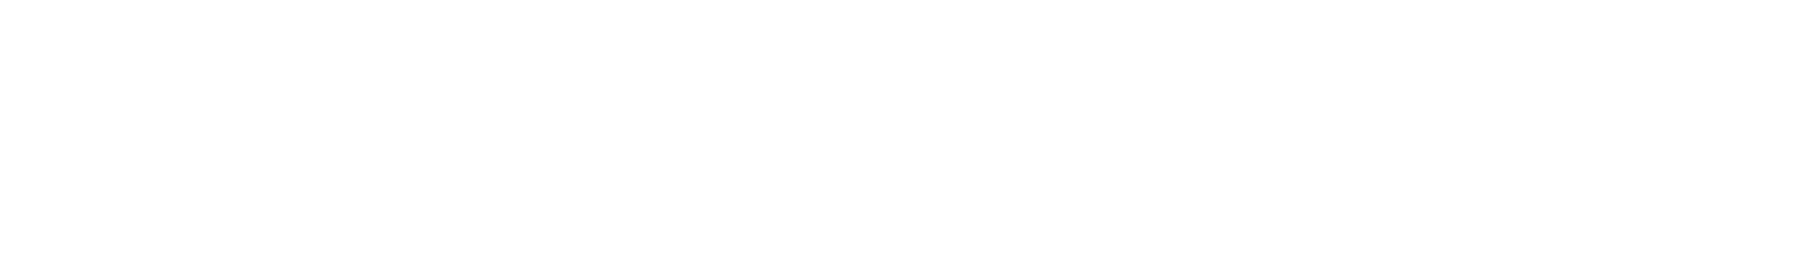 vox 025